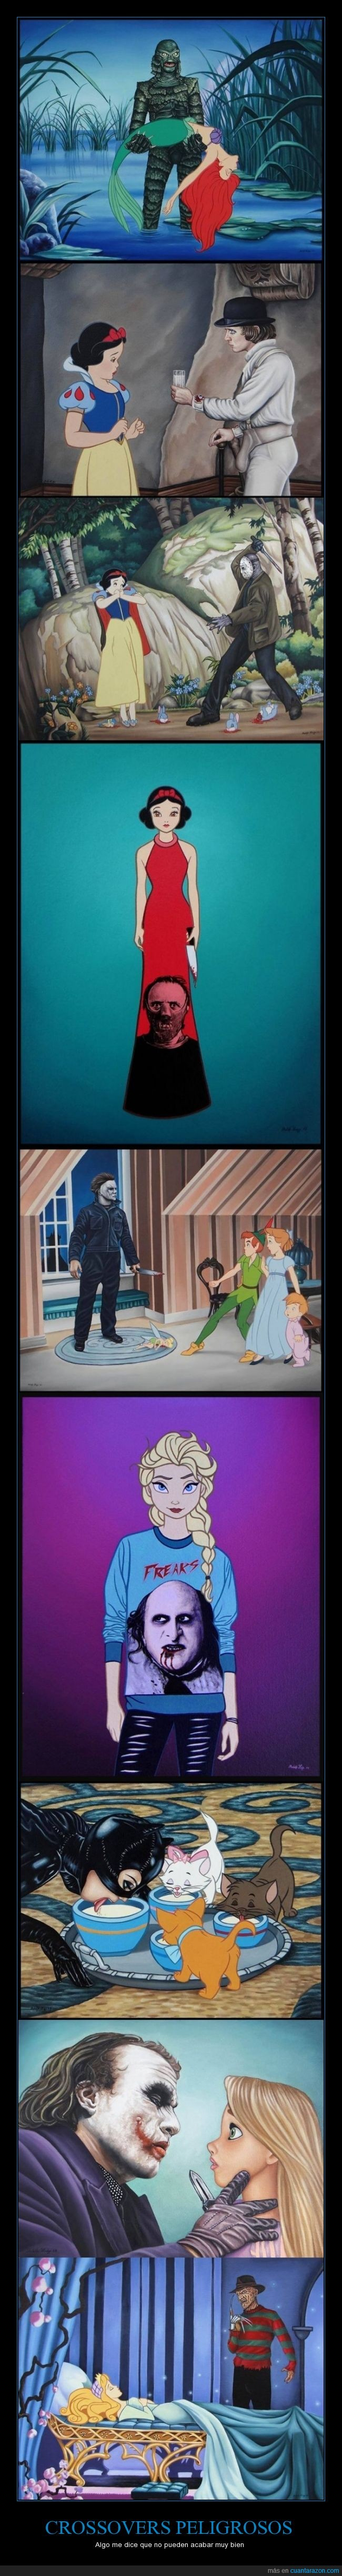 Catwoman,Cenicienta,Disney,Elsa,Famosos,Freddy Kruger,Joker,Personajes,Villanos